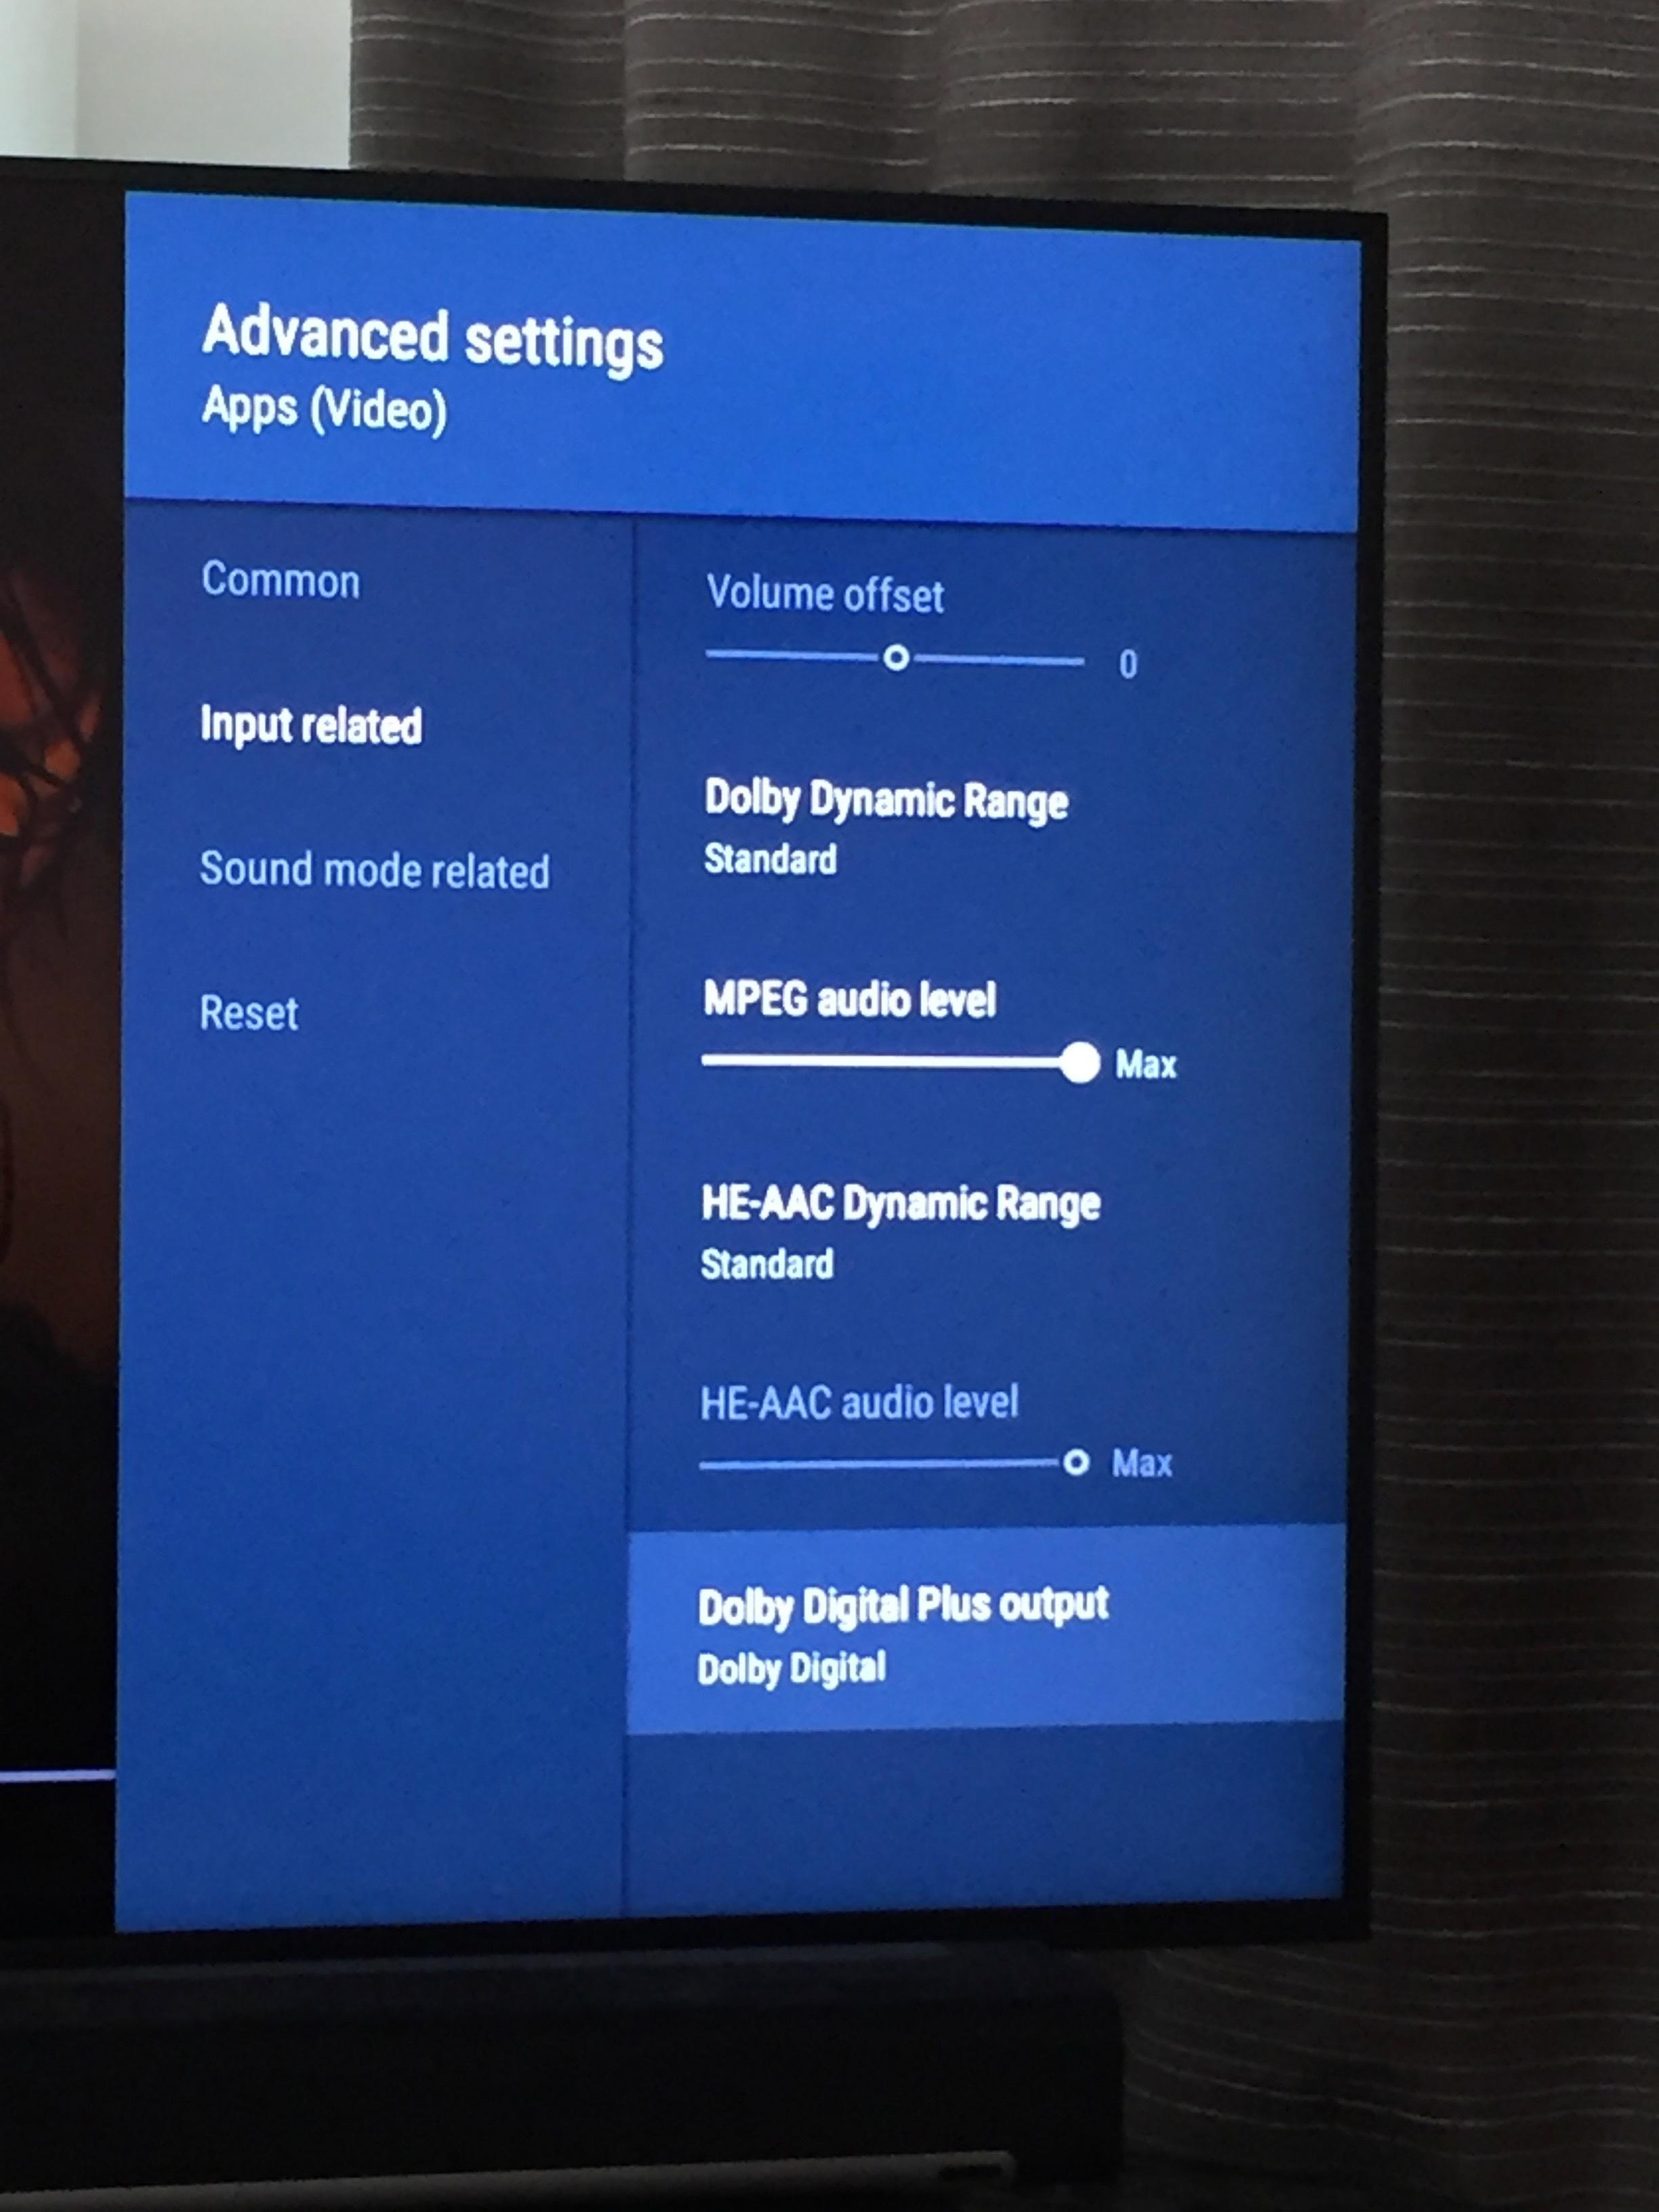 Playbar and Netflix audio 5 1 no longer working, silent